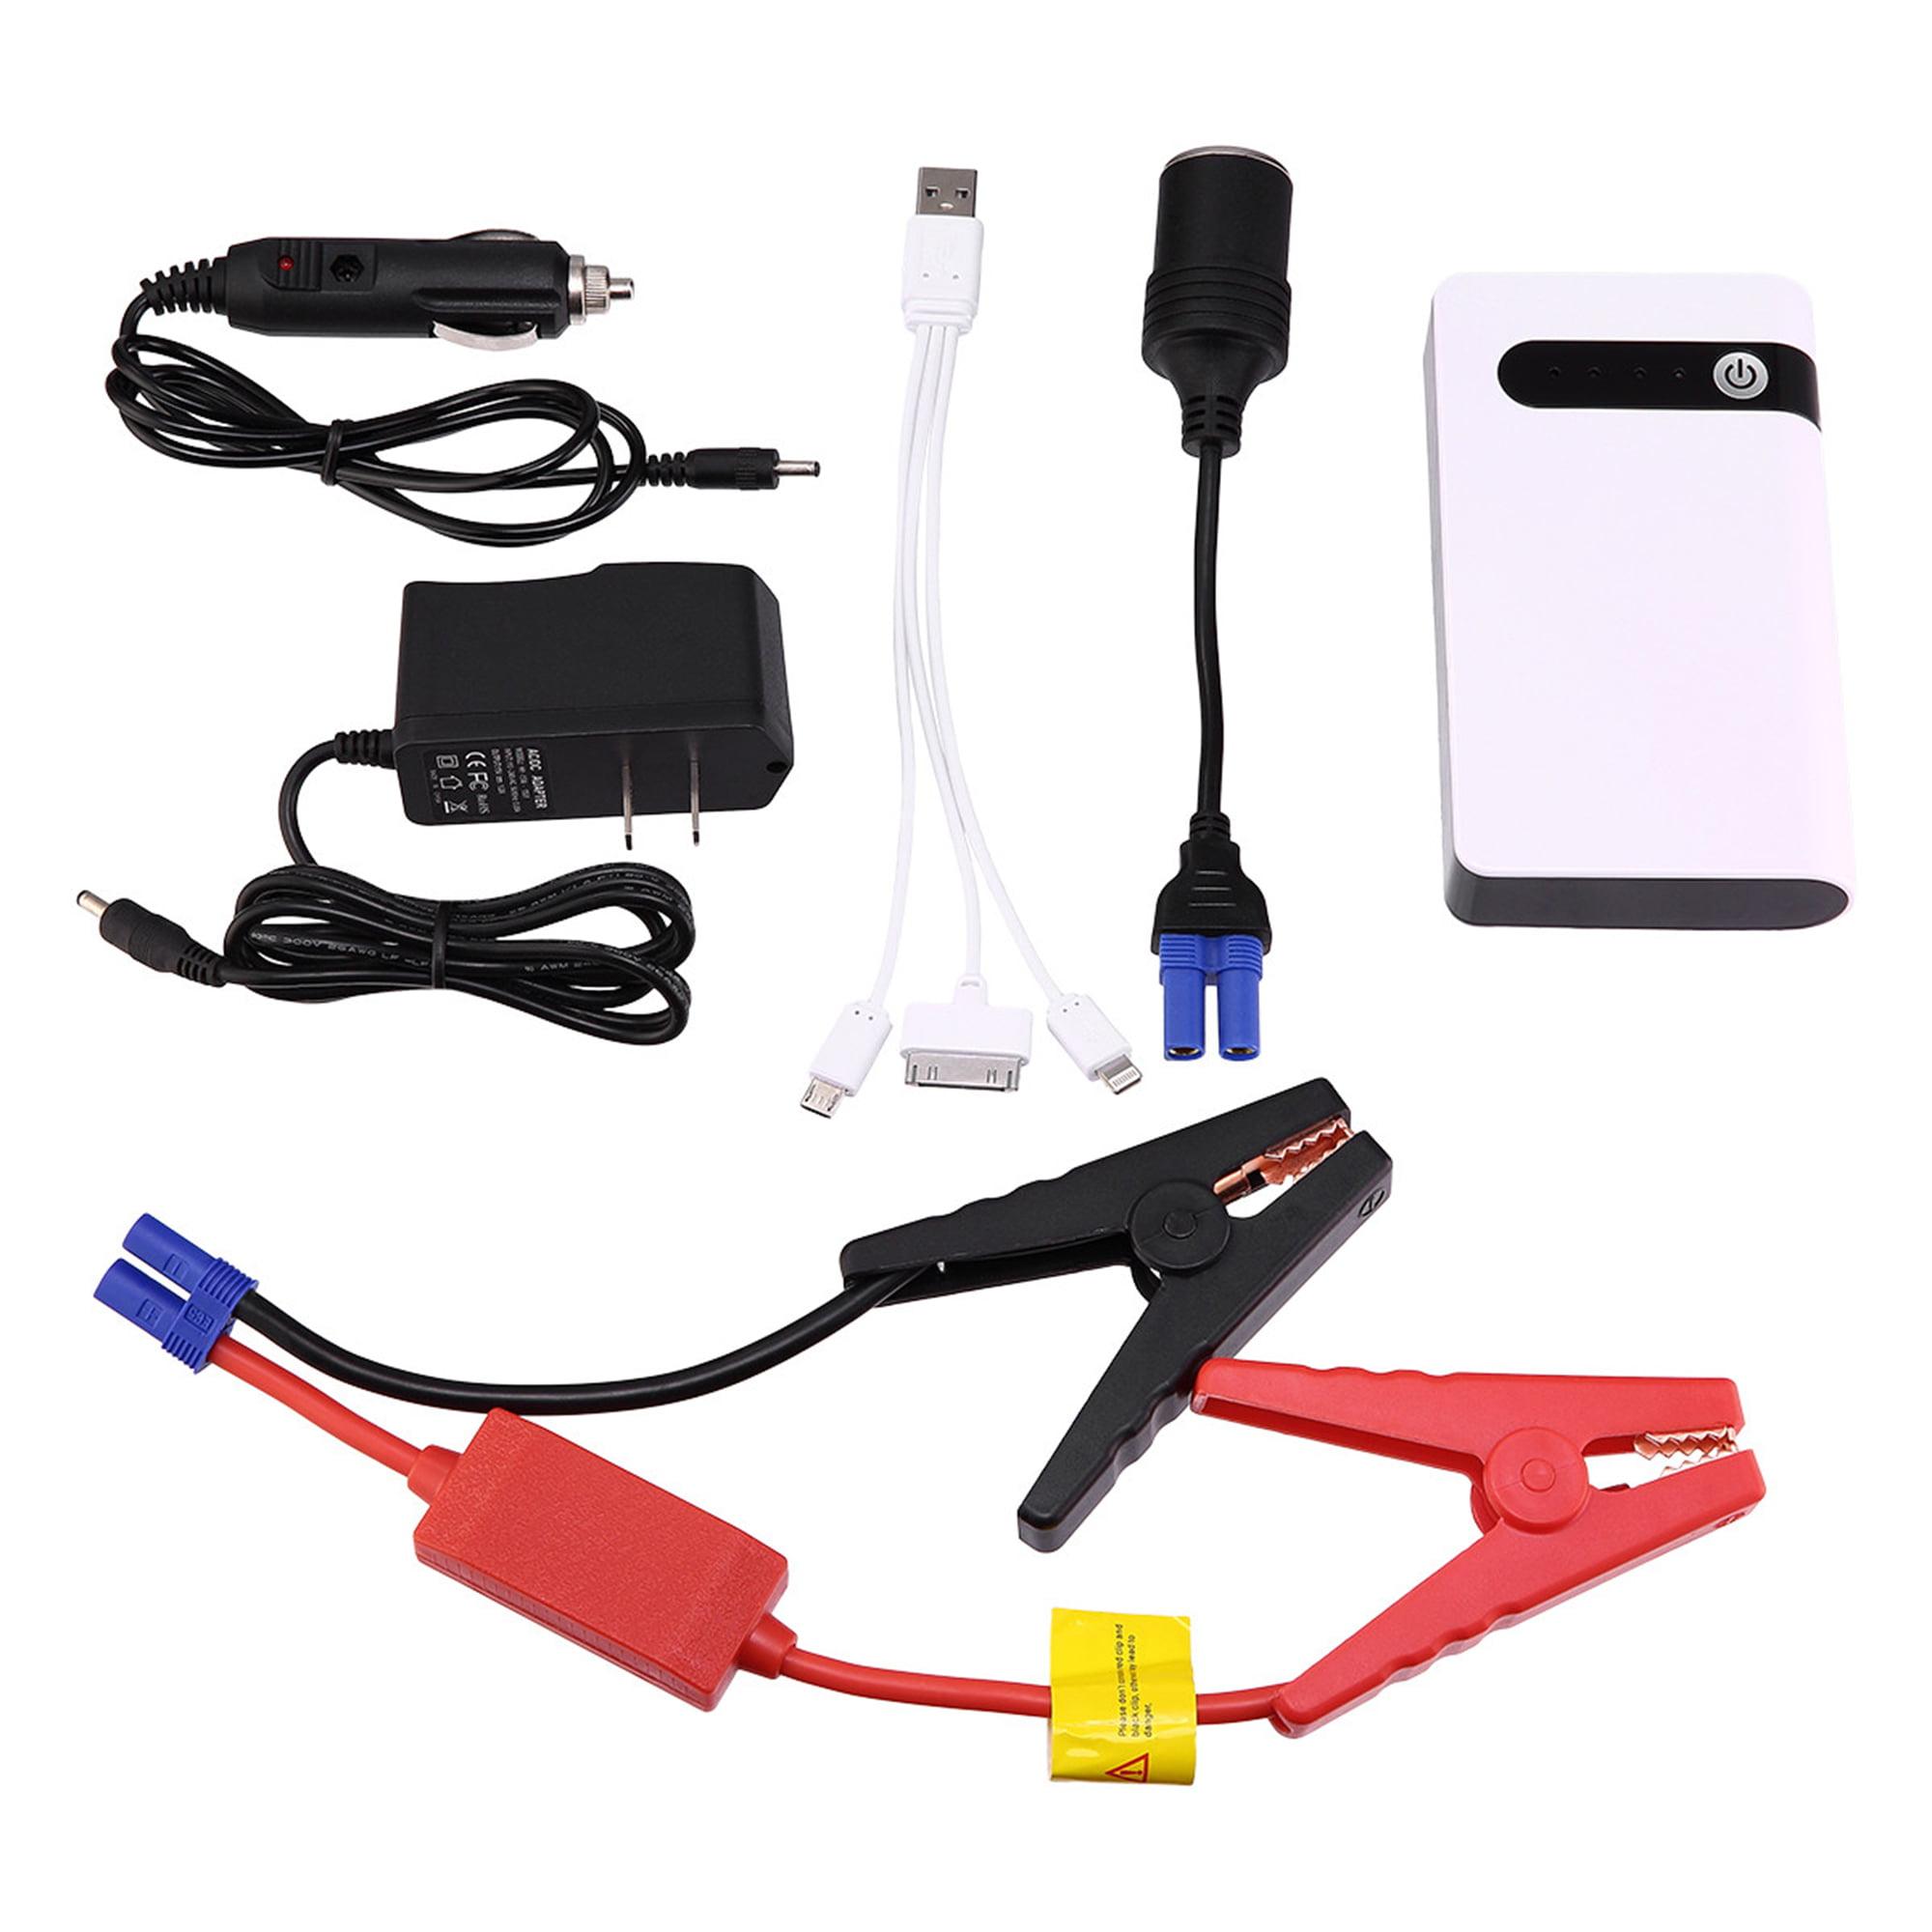 BIYI 12V 20000mAh Mini Portable Multifonctionnel De Voiture Jump Starter Power Booster Chargeur de Batterie Emergency Start Charger noir